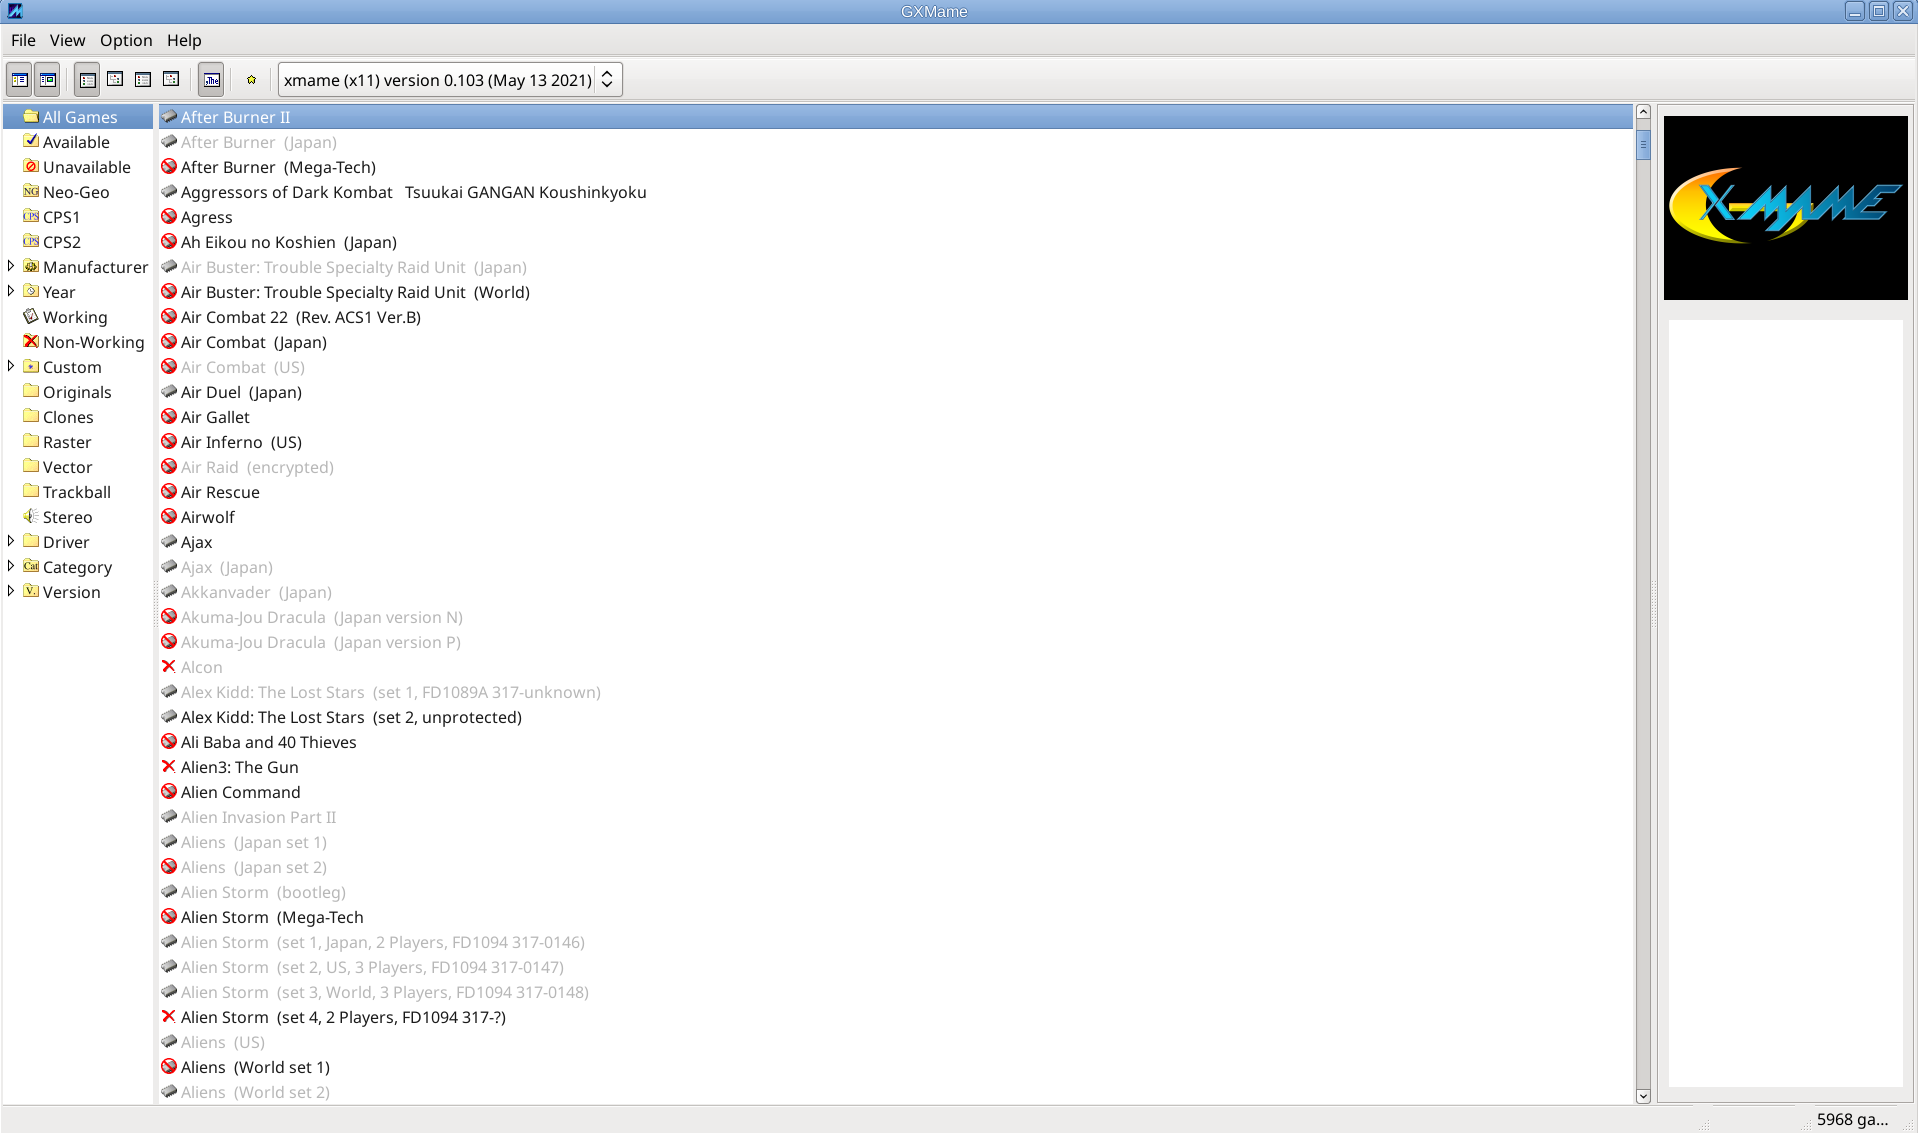 gxmame-screenshot-debian-10-gnu-linux-mate-desktop